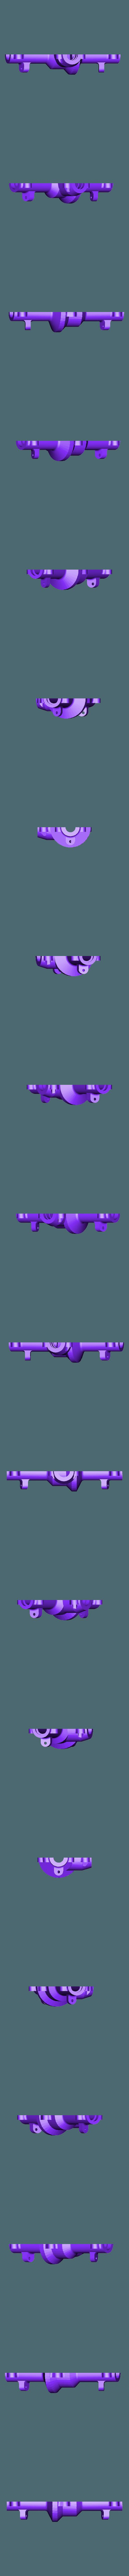 TruckV3_Axle1_rear_bottom.STL Download STL file 3D Printed RC Truck V3 • 3D print model, MrCrankyface